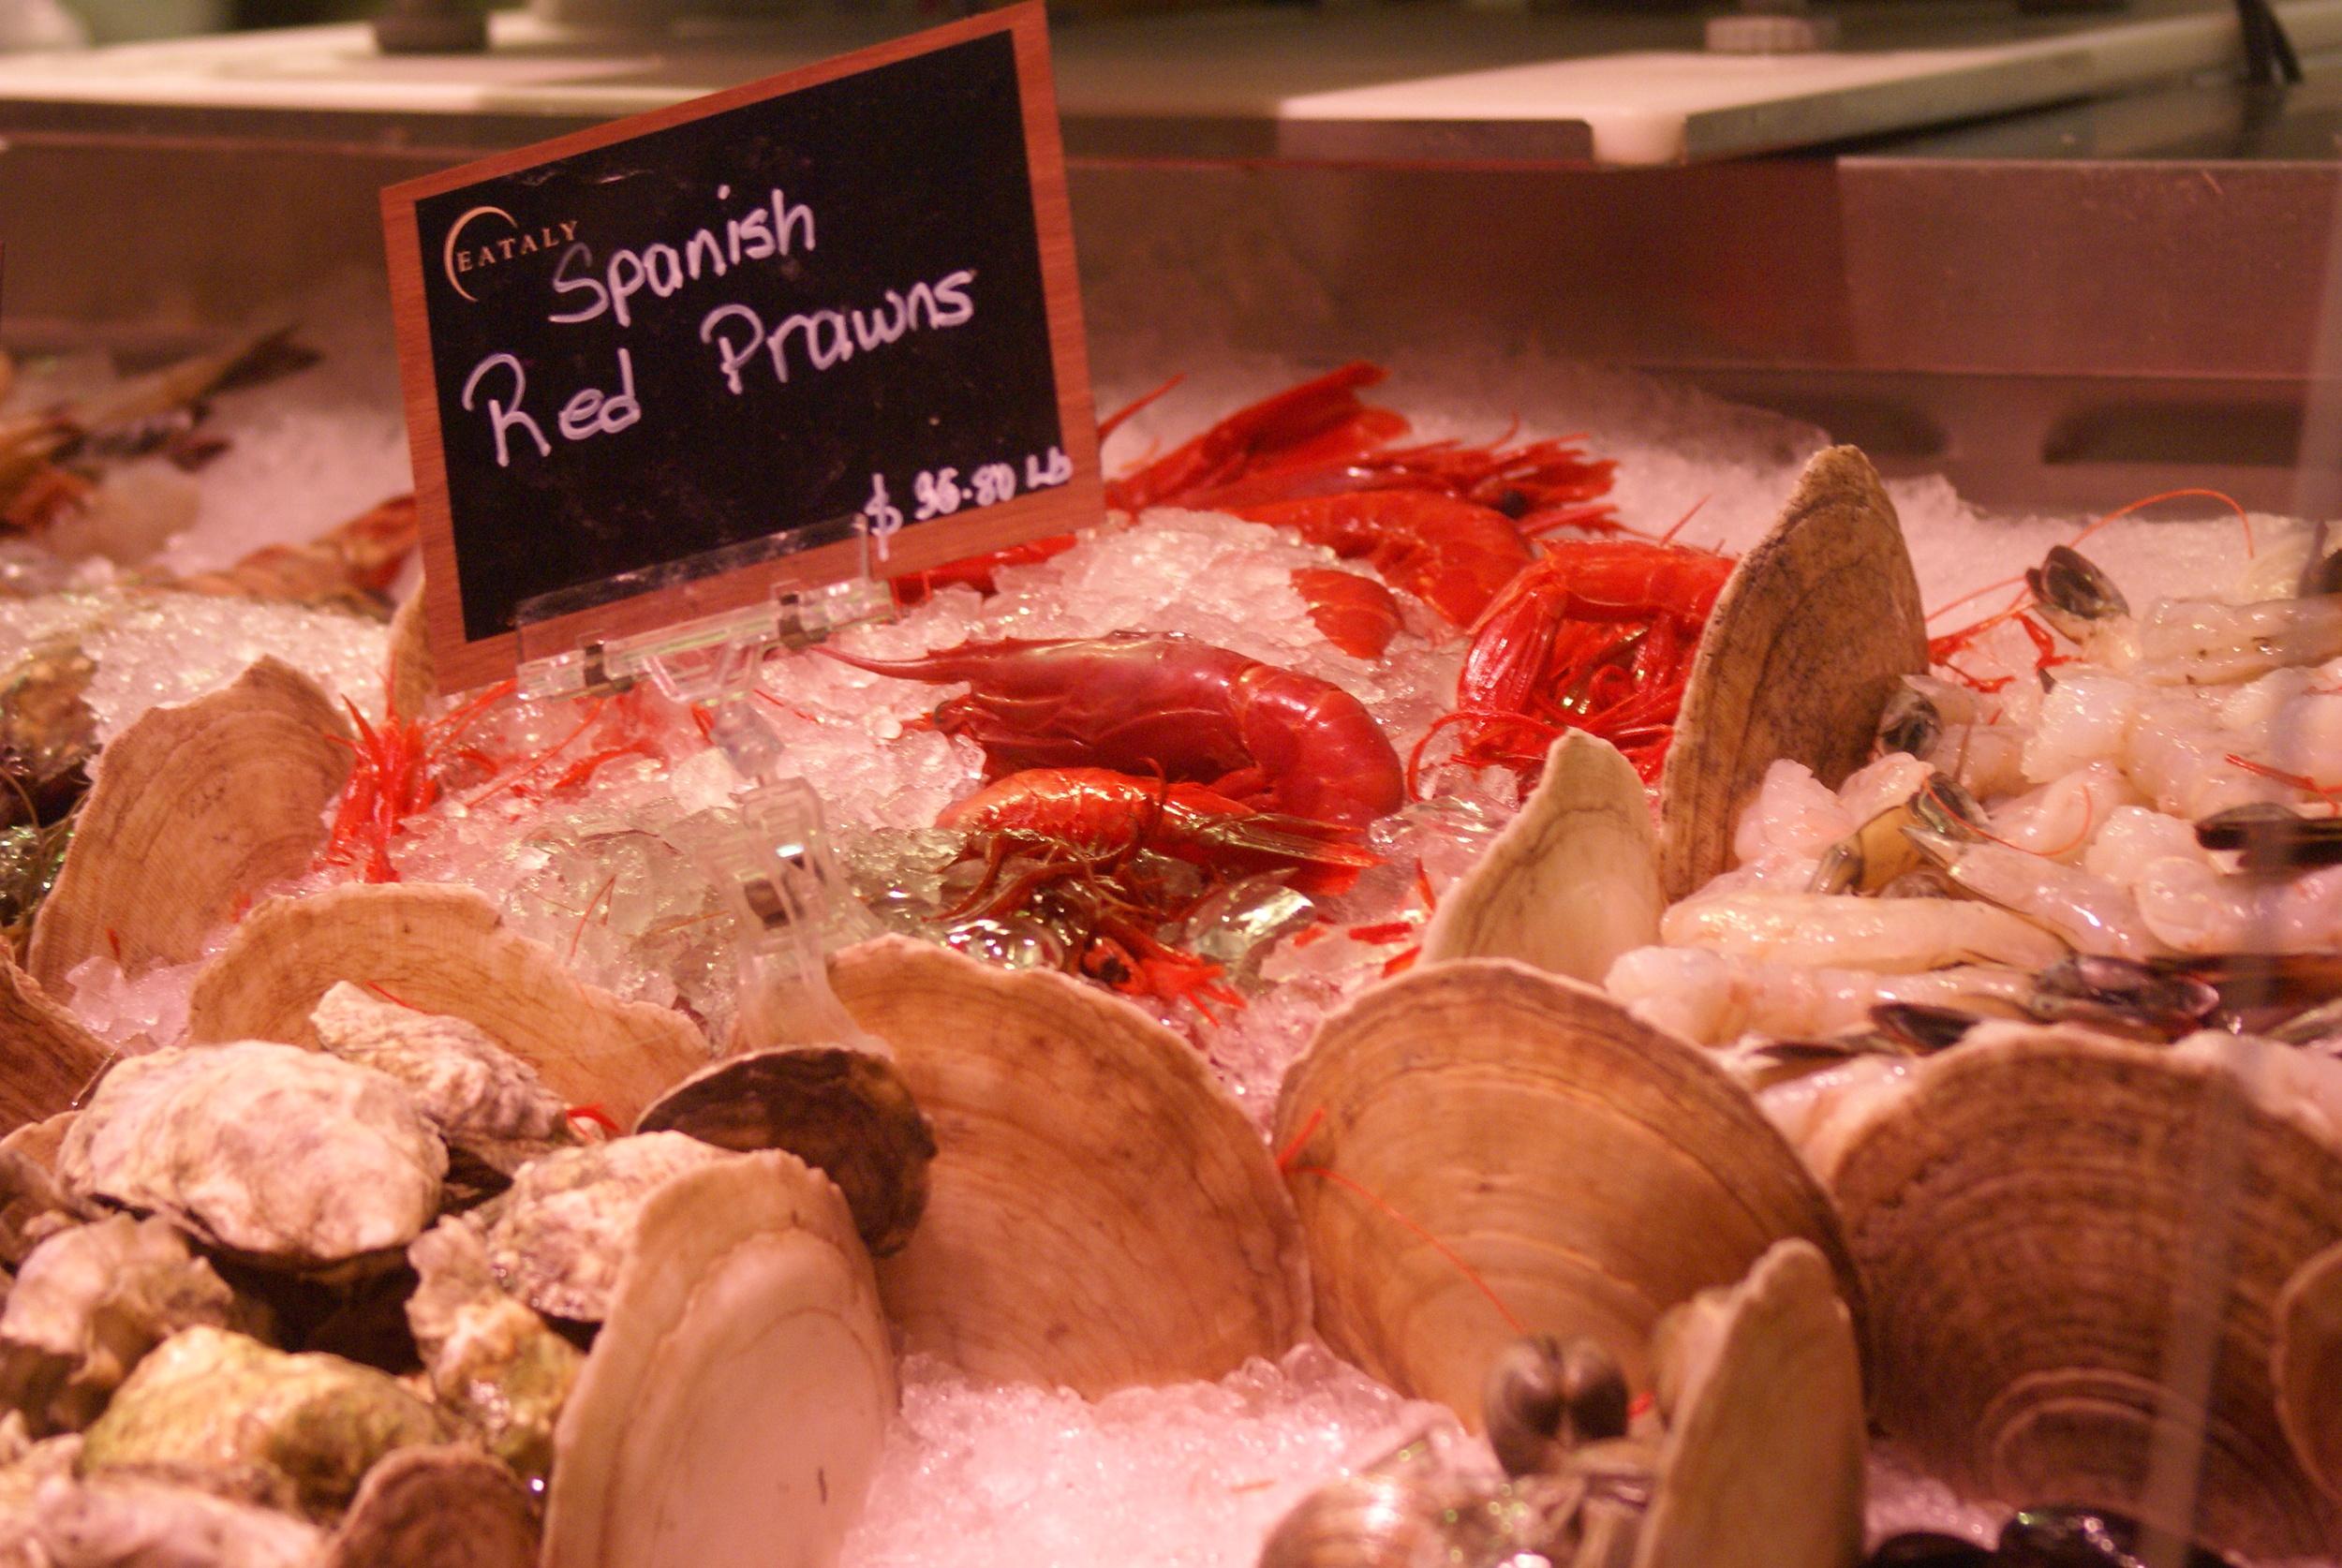 Fish Market at Eataly.